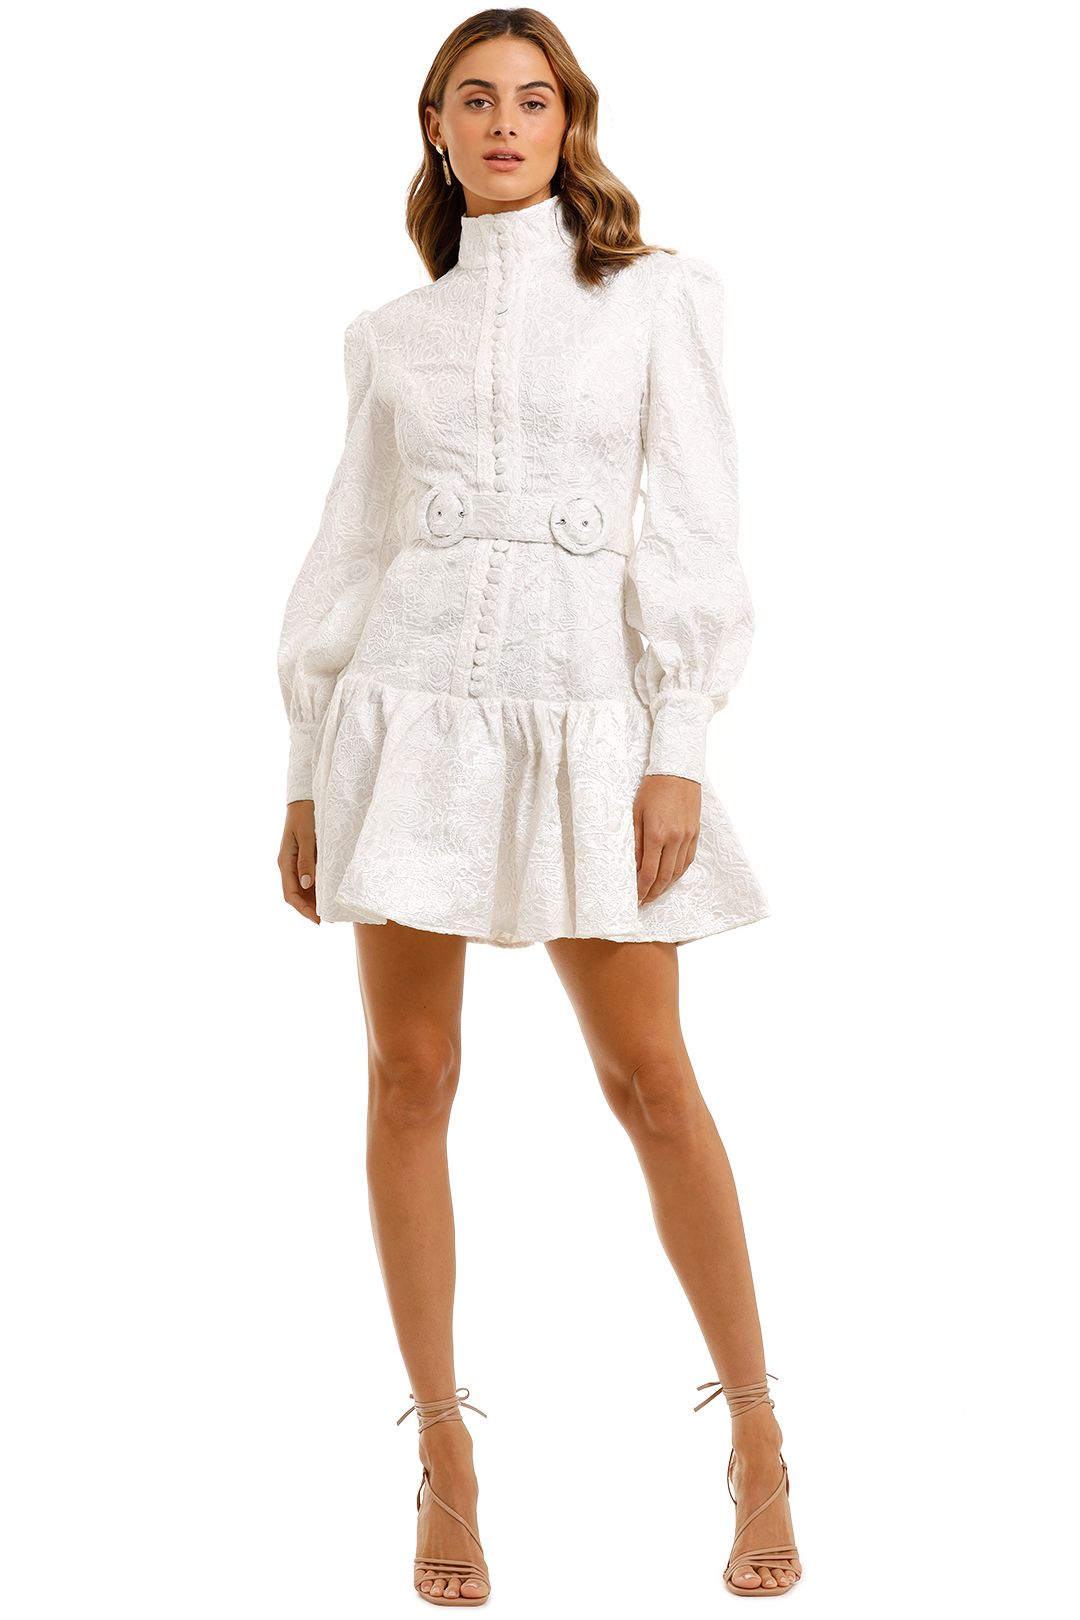 LEO & LIN Transcendence Rose Lace Short Dress White